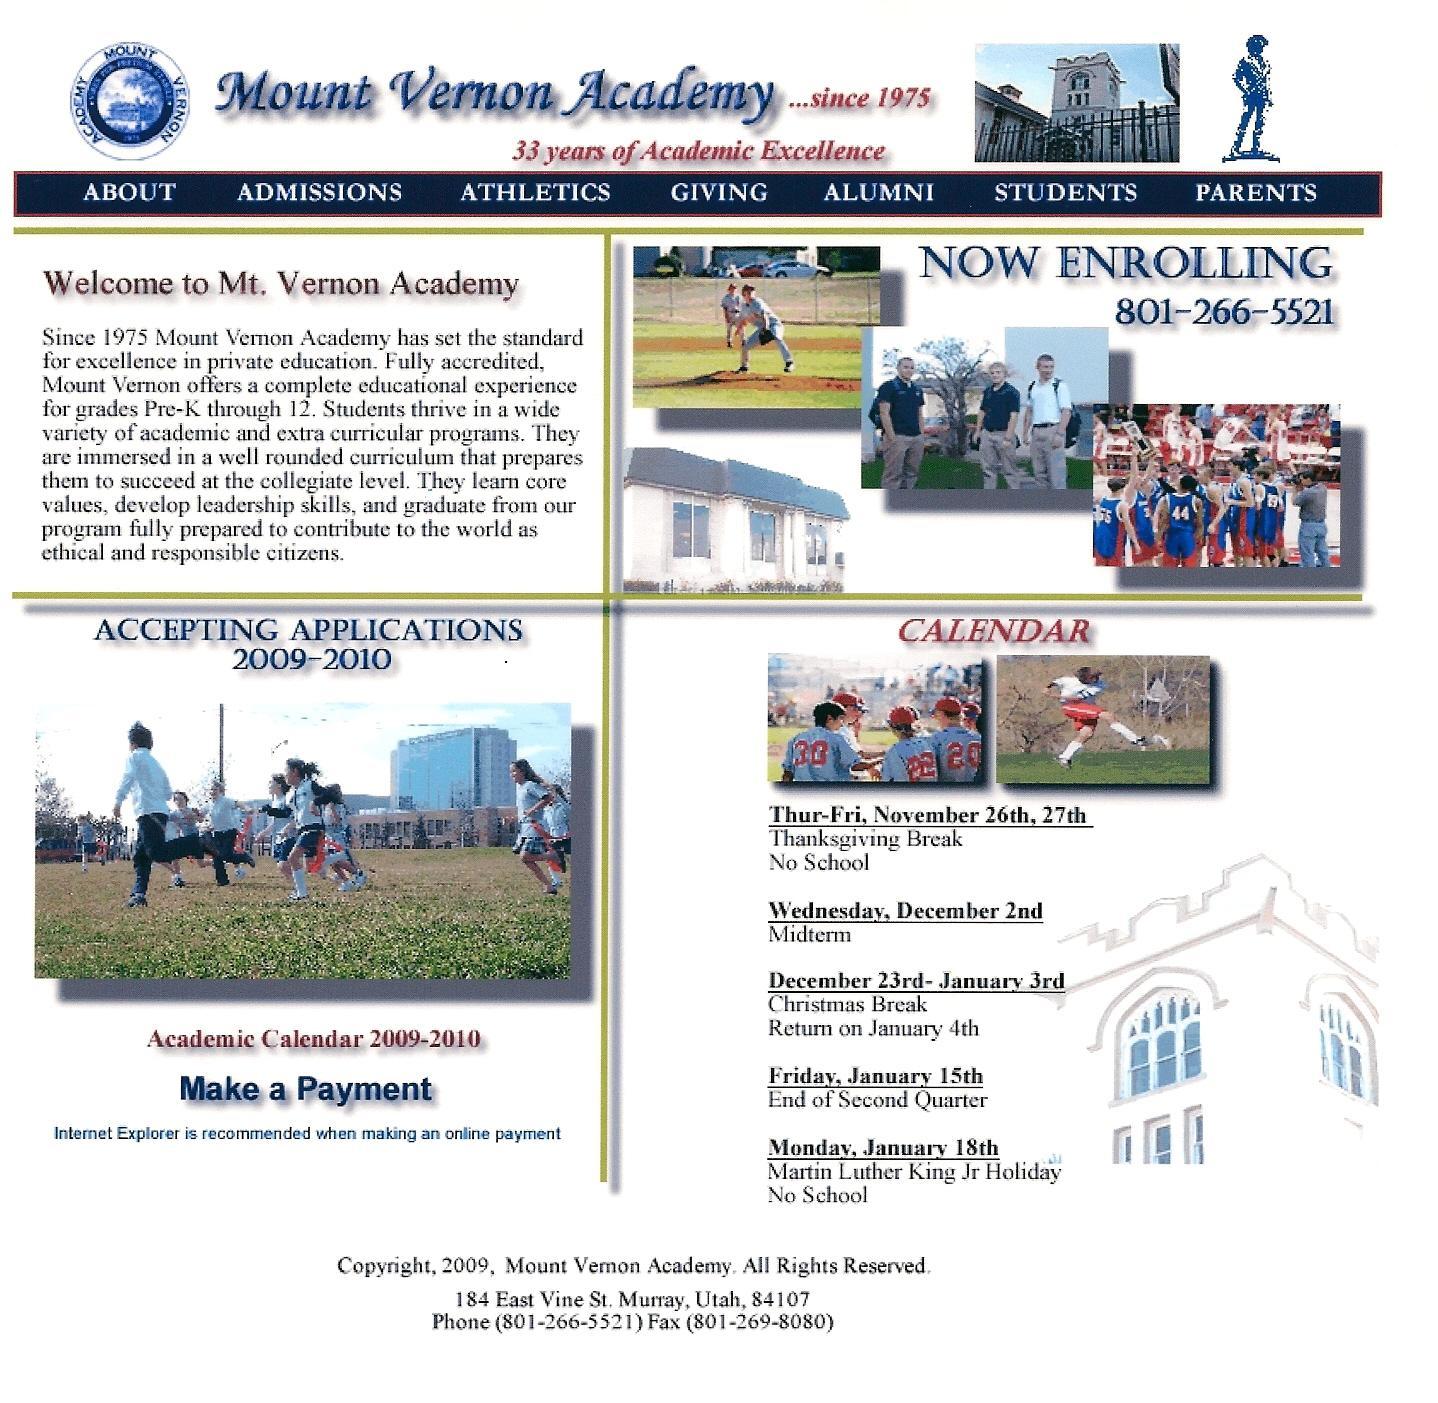 Mount Vernon Academy